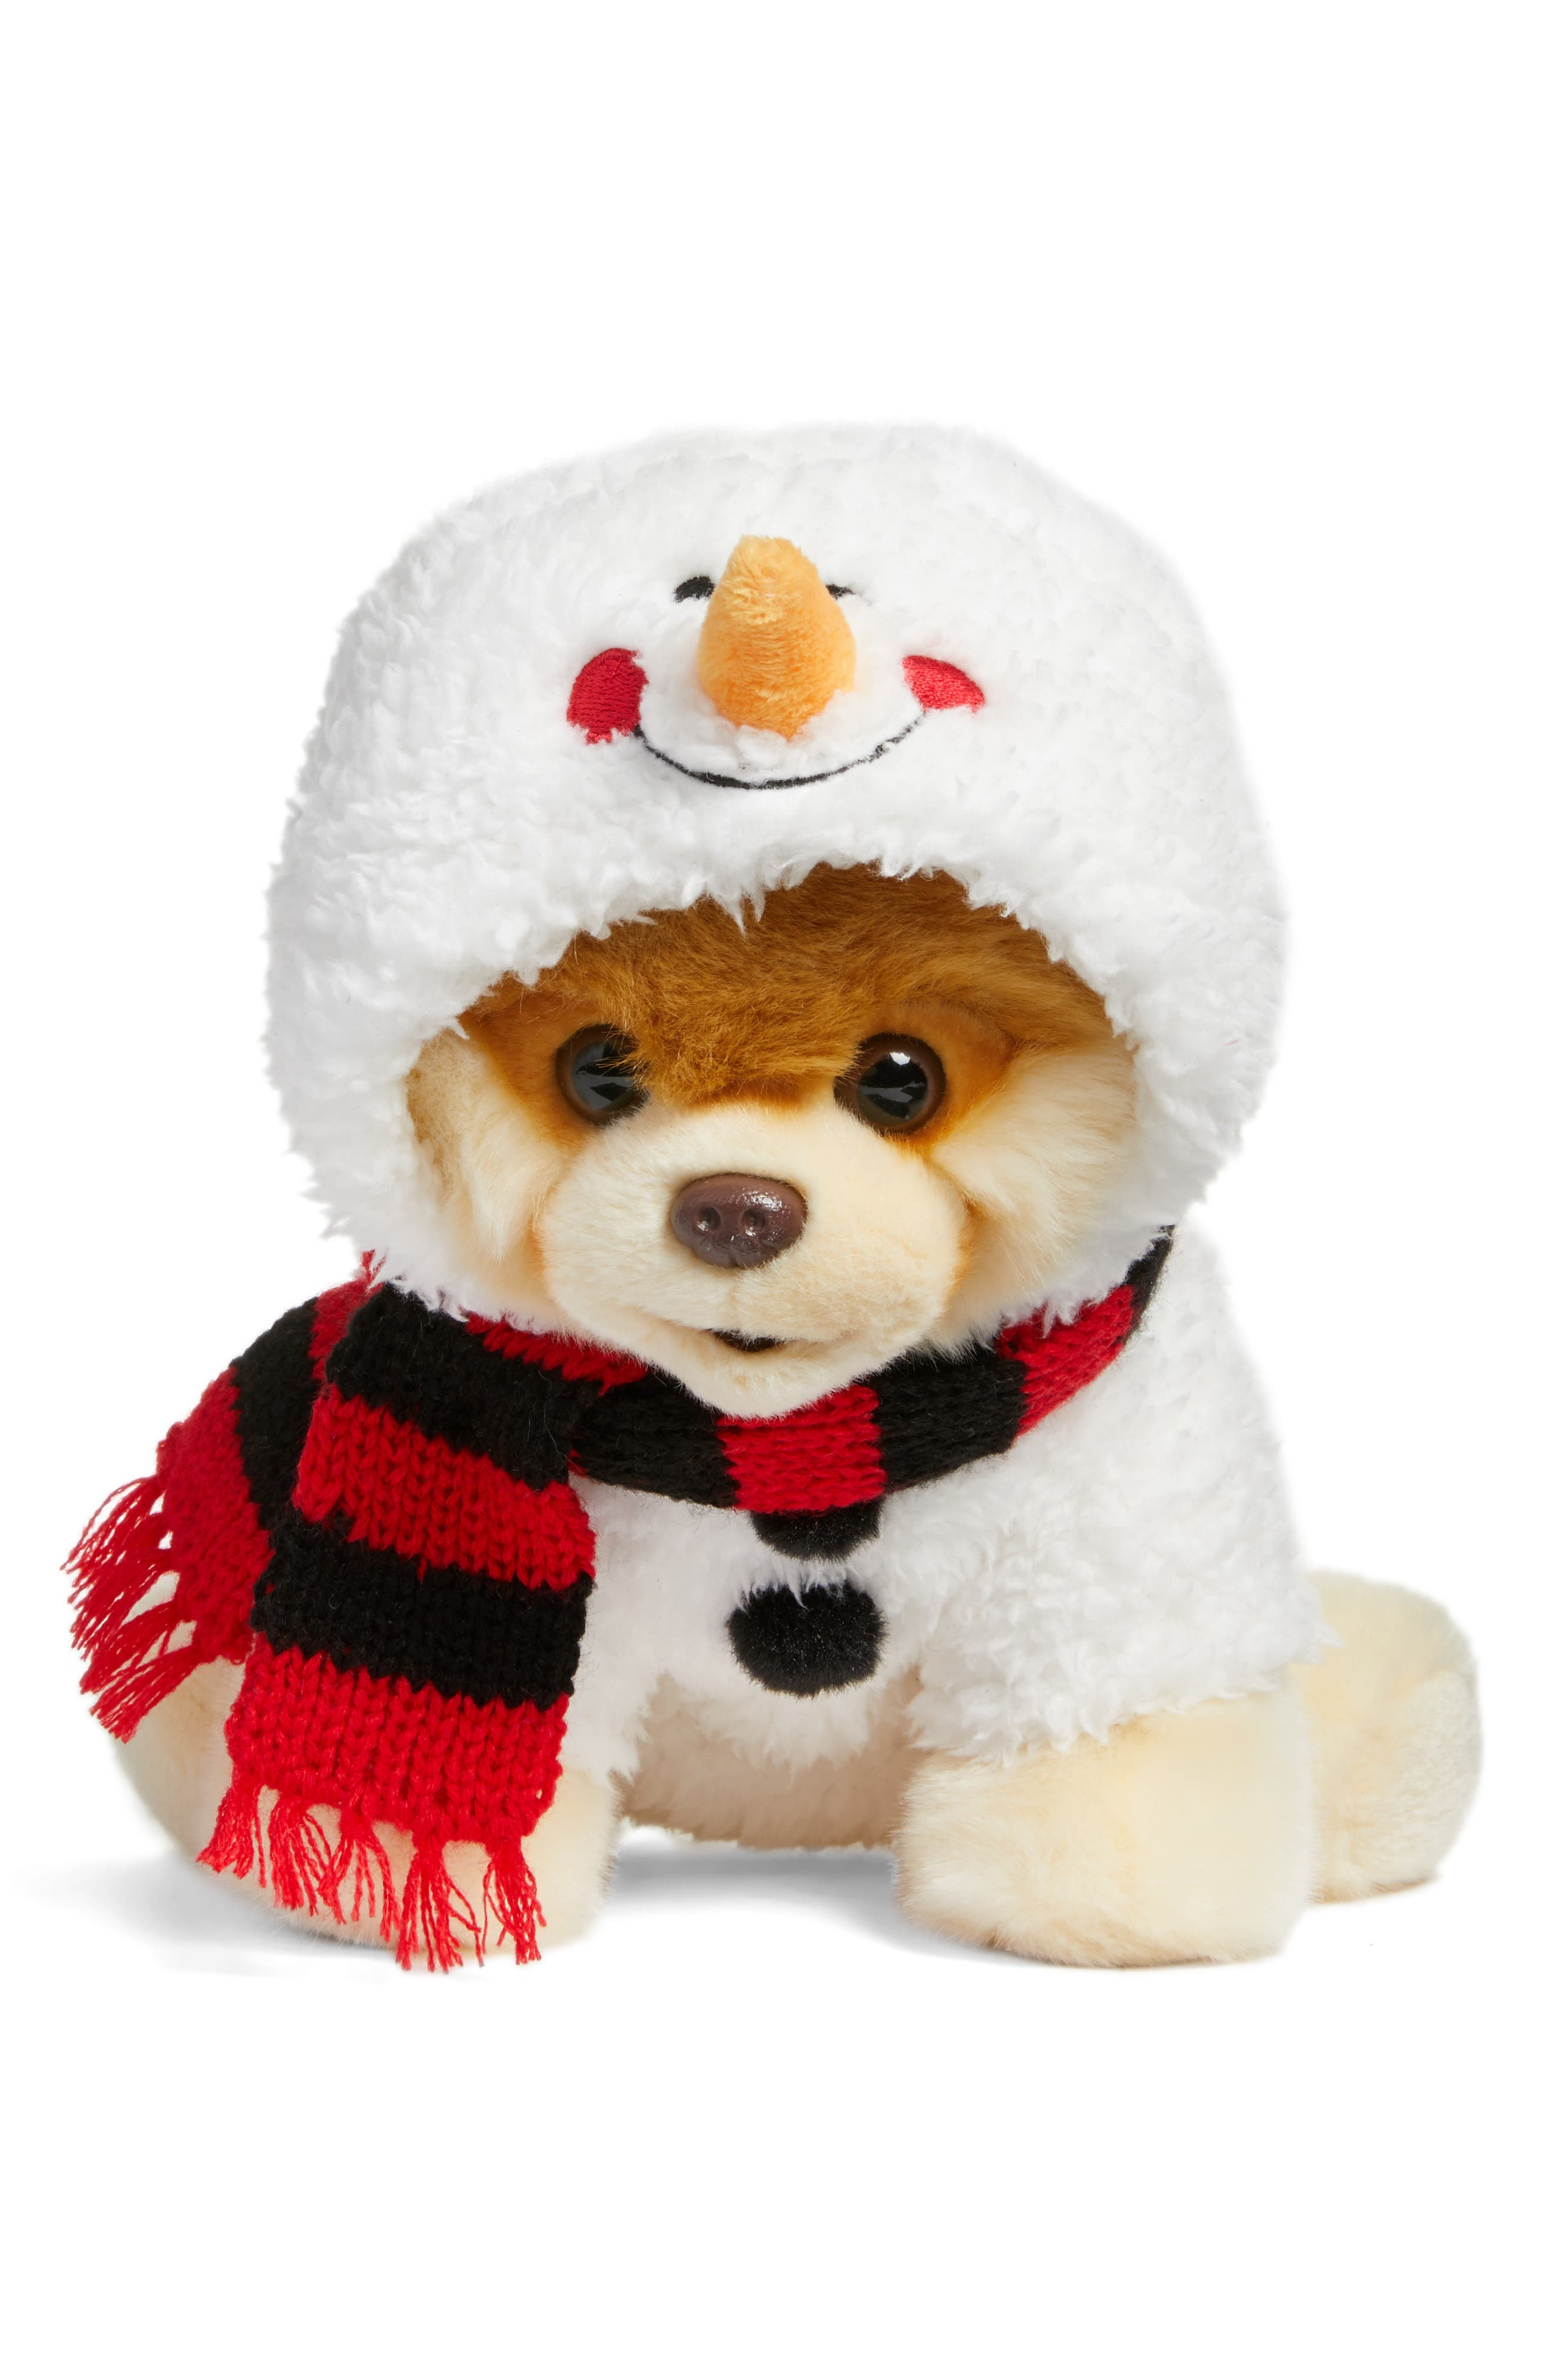 Boo - Snowman Hoodie Stuffed Animal,                             Main thumbnail 1, color,                             White